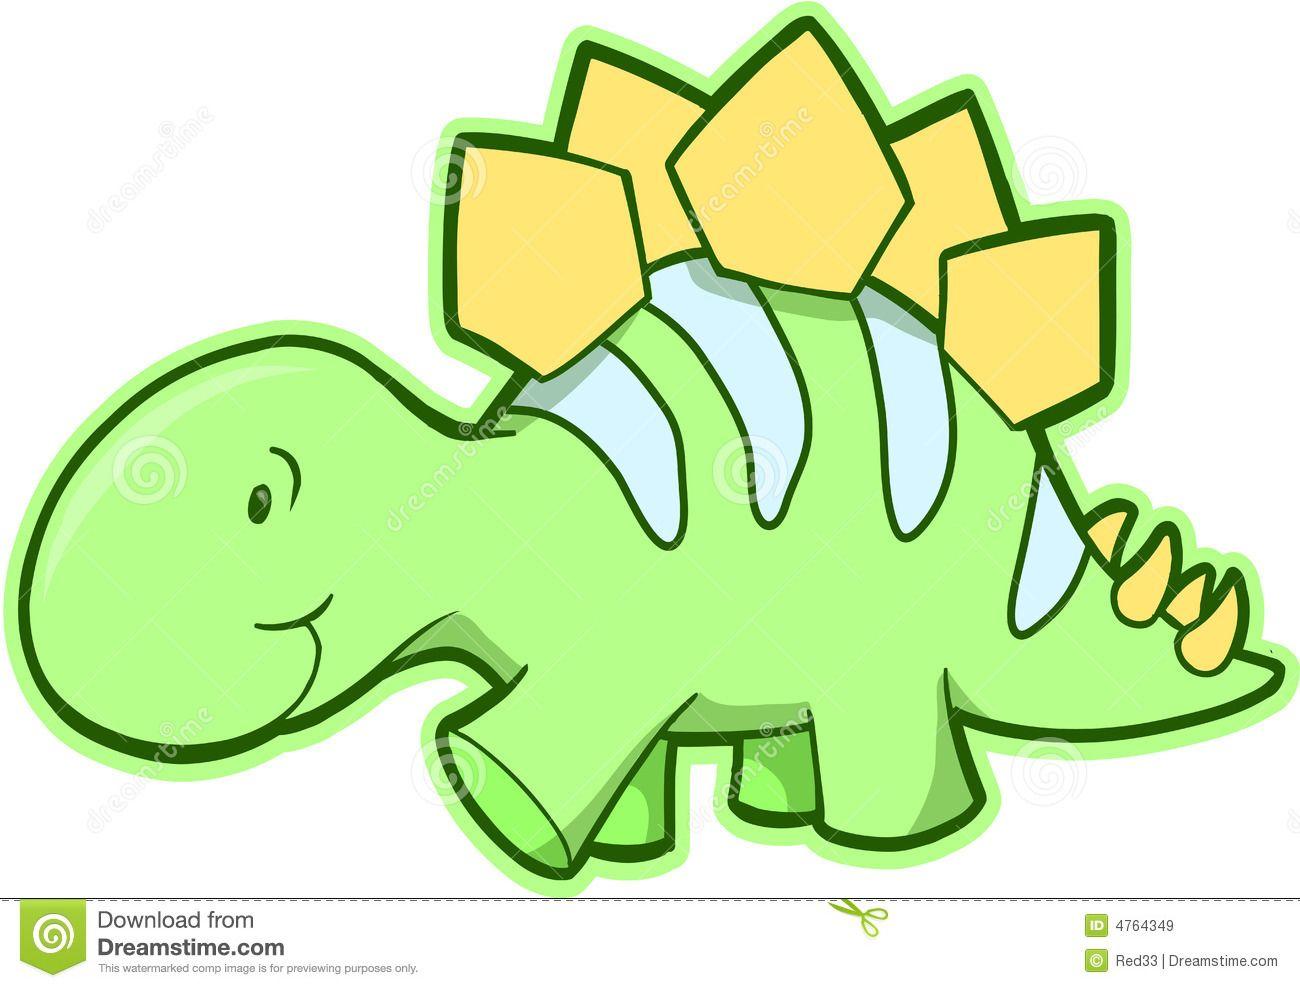 small resolution of dinossauro cute pesquisa google royalty free photos cute dinosaur free stock image